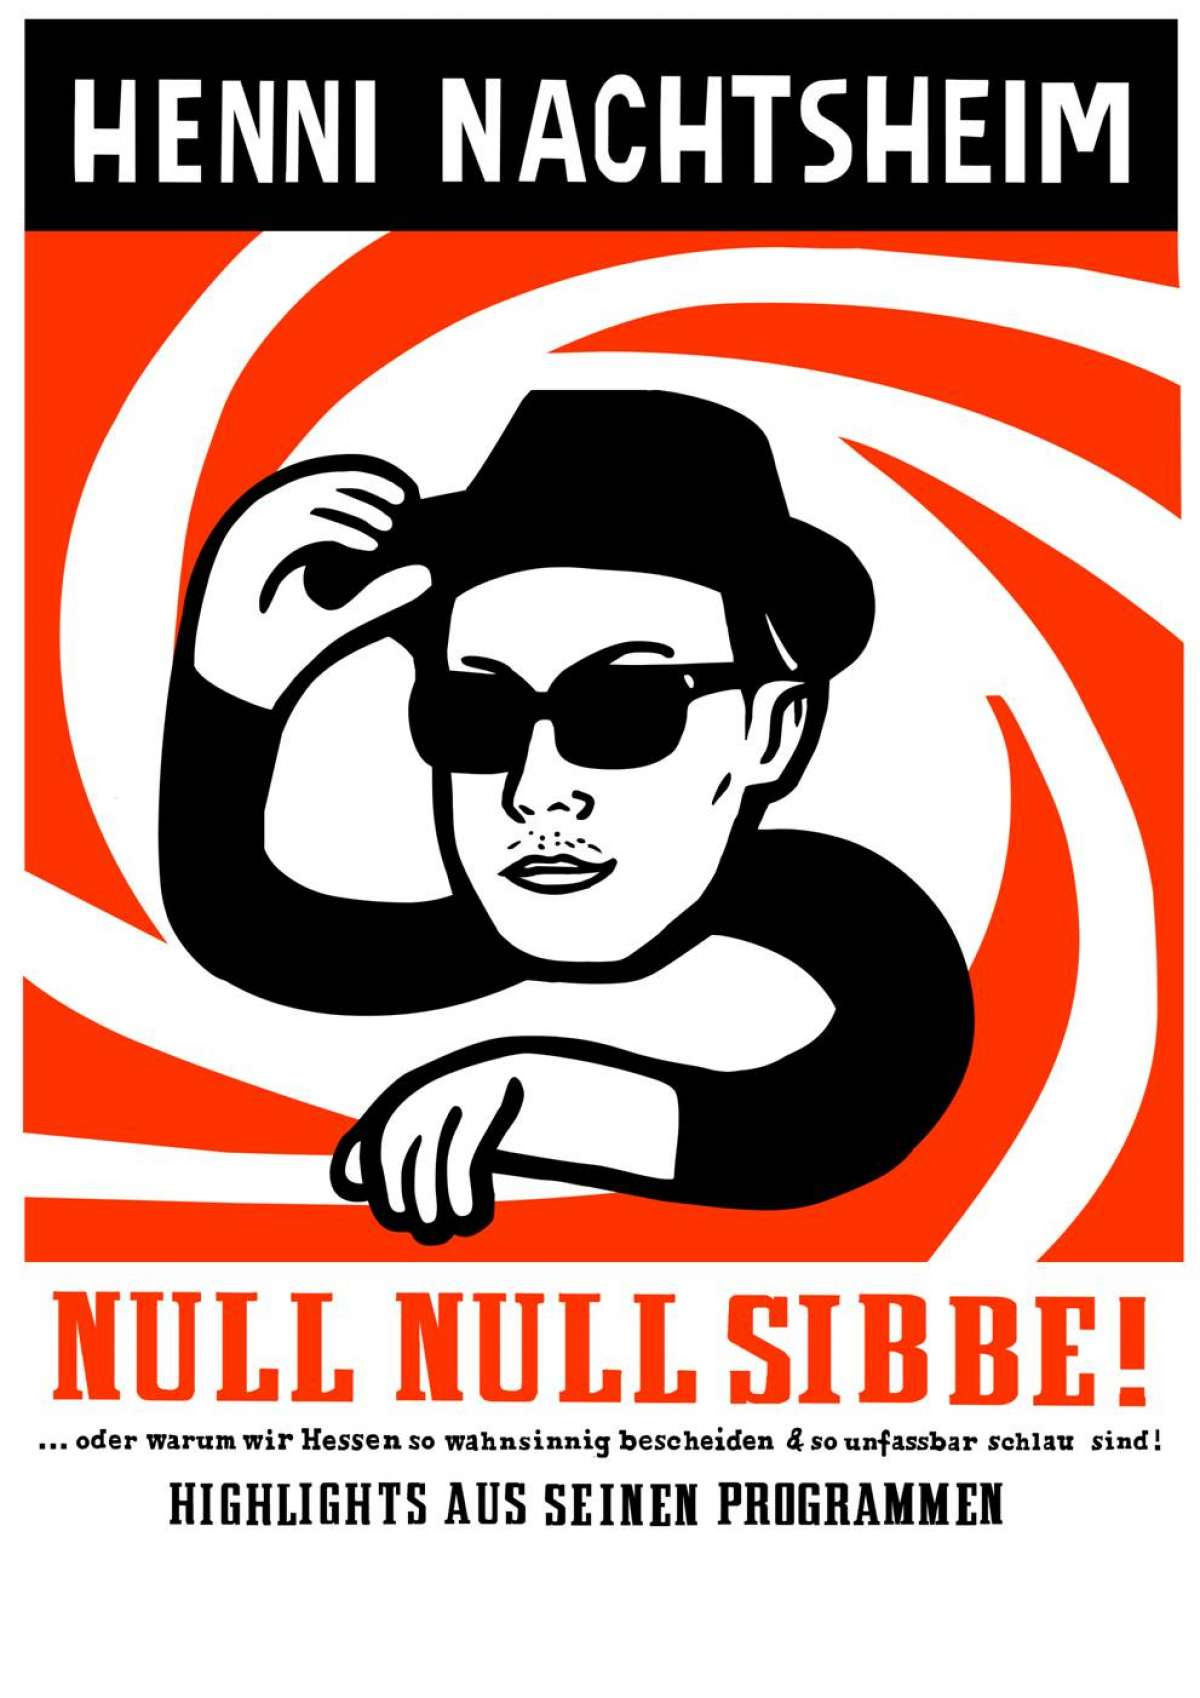 Null Null Sibbe (AUSVERKAUFT!) - Henni Nachtsheim - Hospitalkapelle Treysa - Schwalmstadt-Treysa